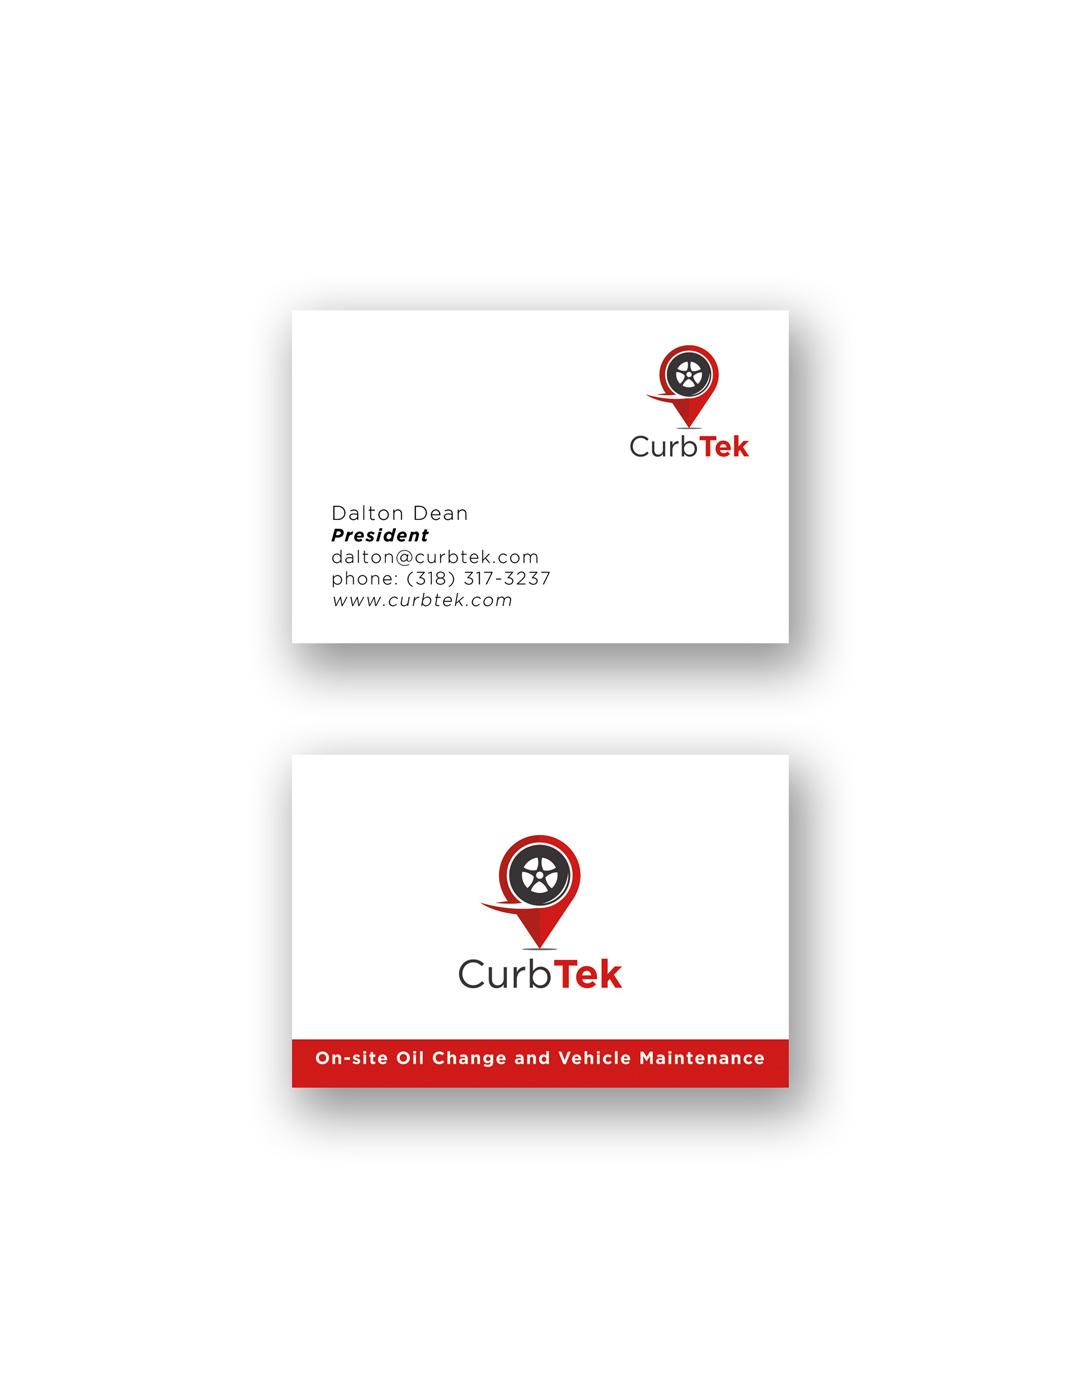 Curbtek-business-cards.jpg